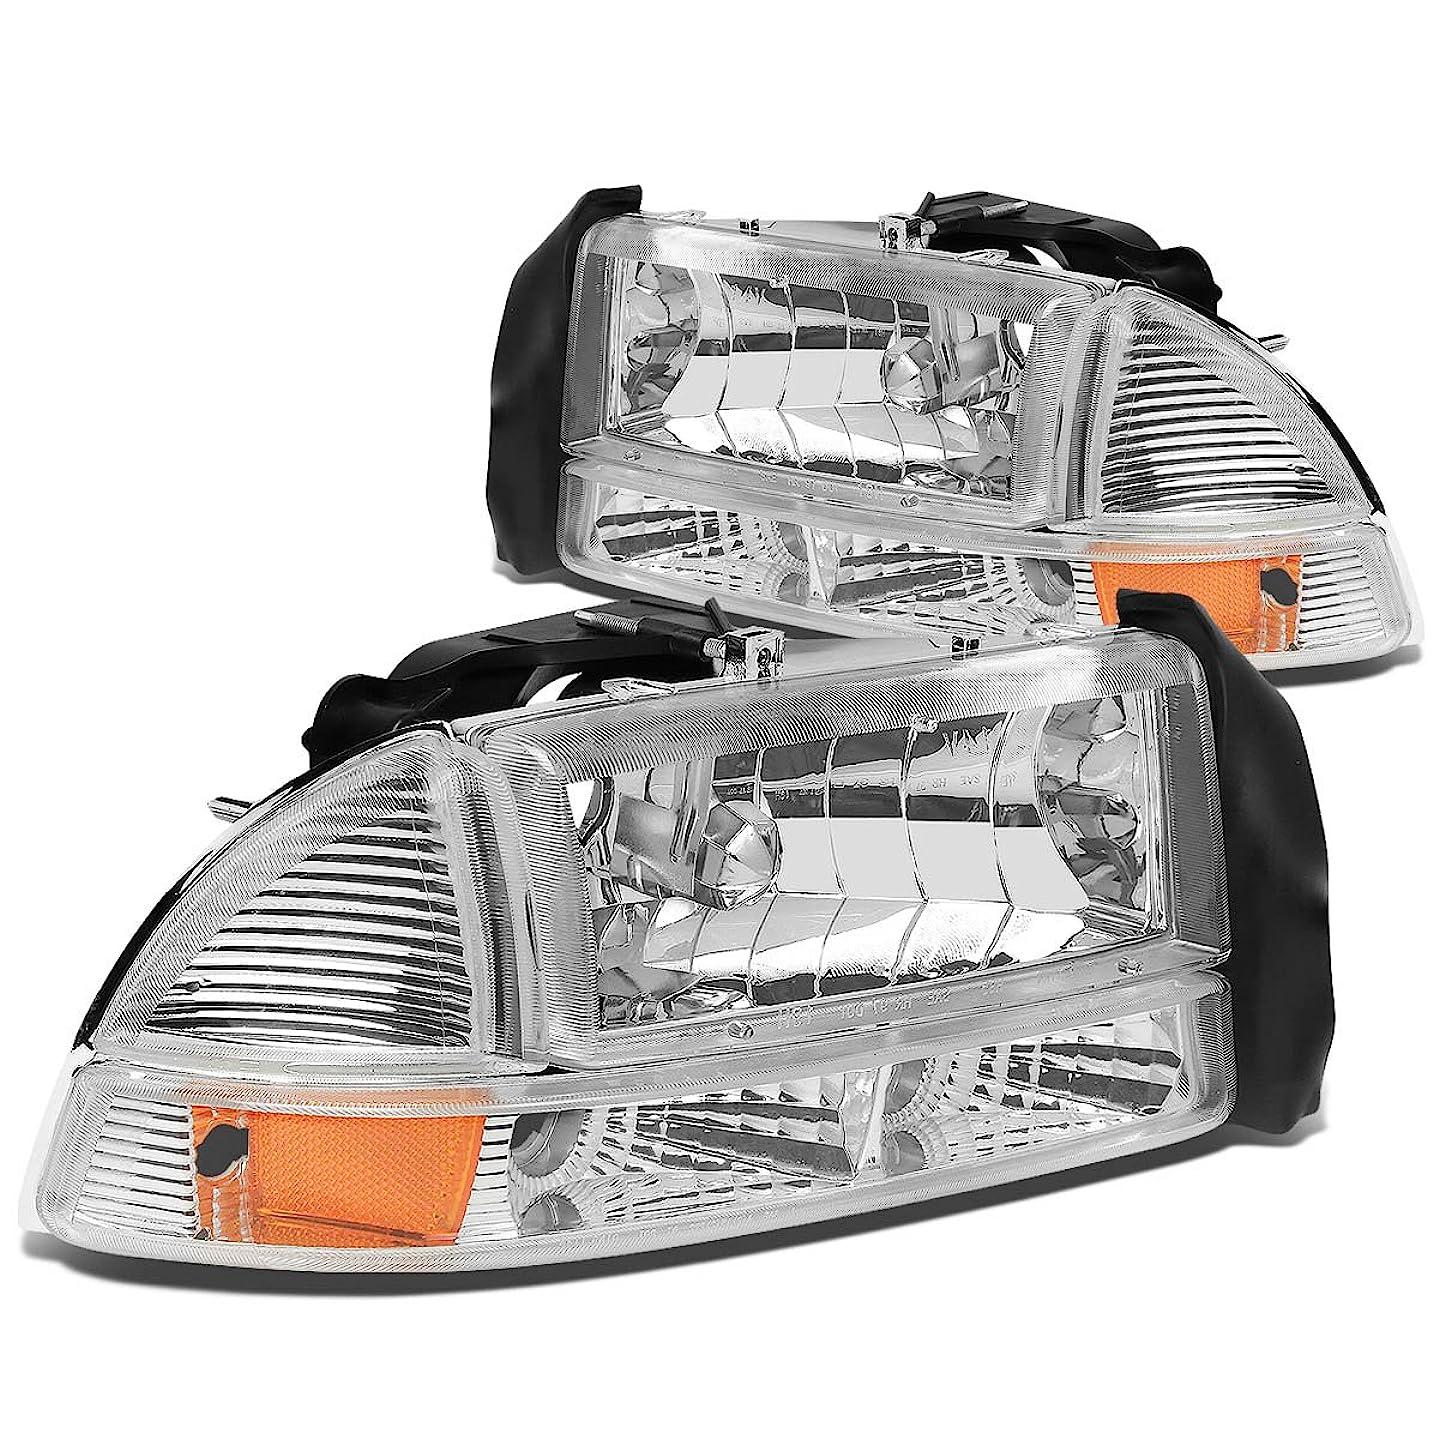 DNA Motoring HL-OH-DD974P-CH-AM Headlight Assembly, Driver & Passenger Side